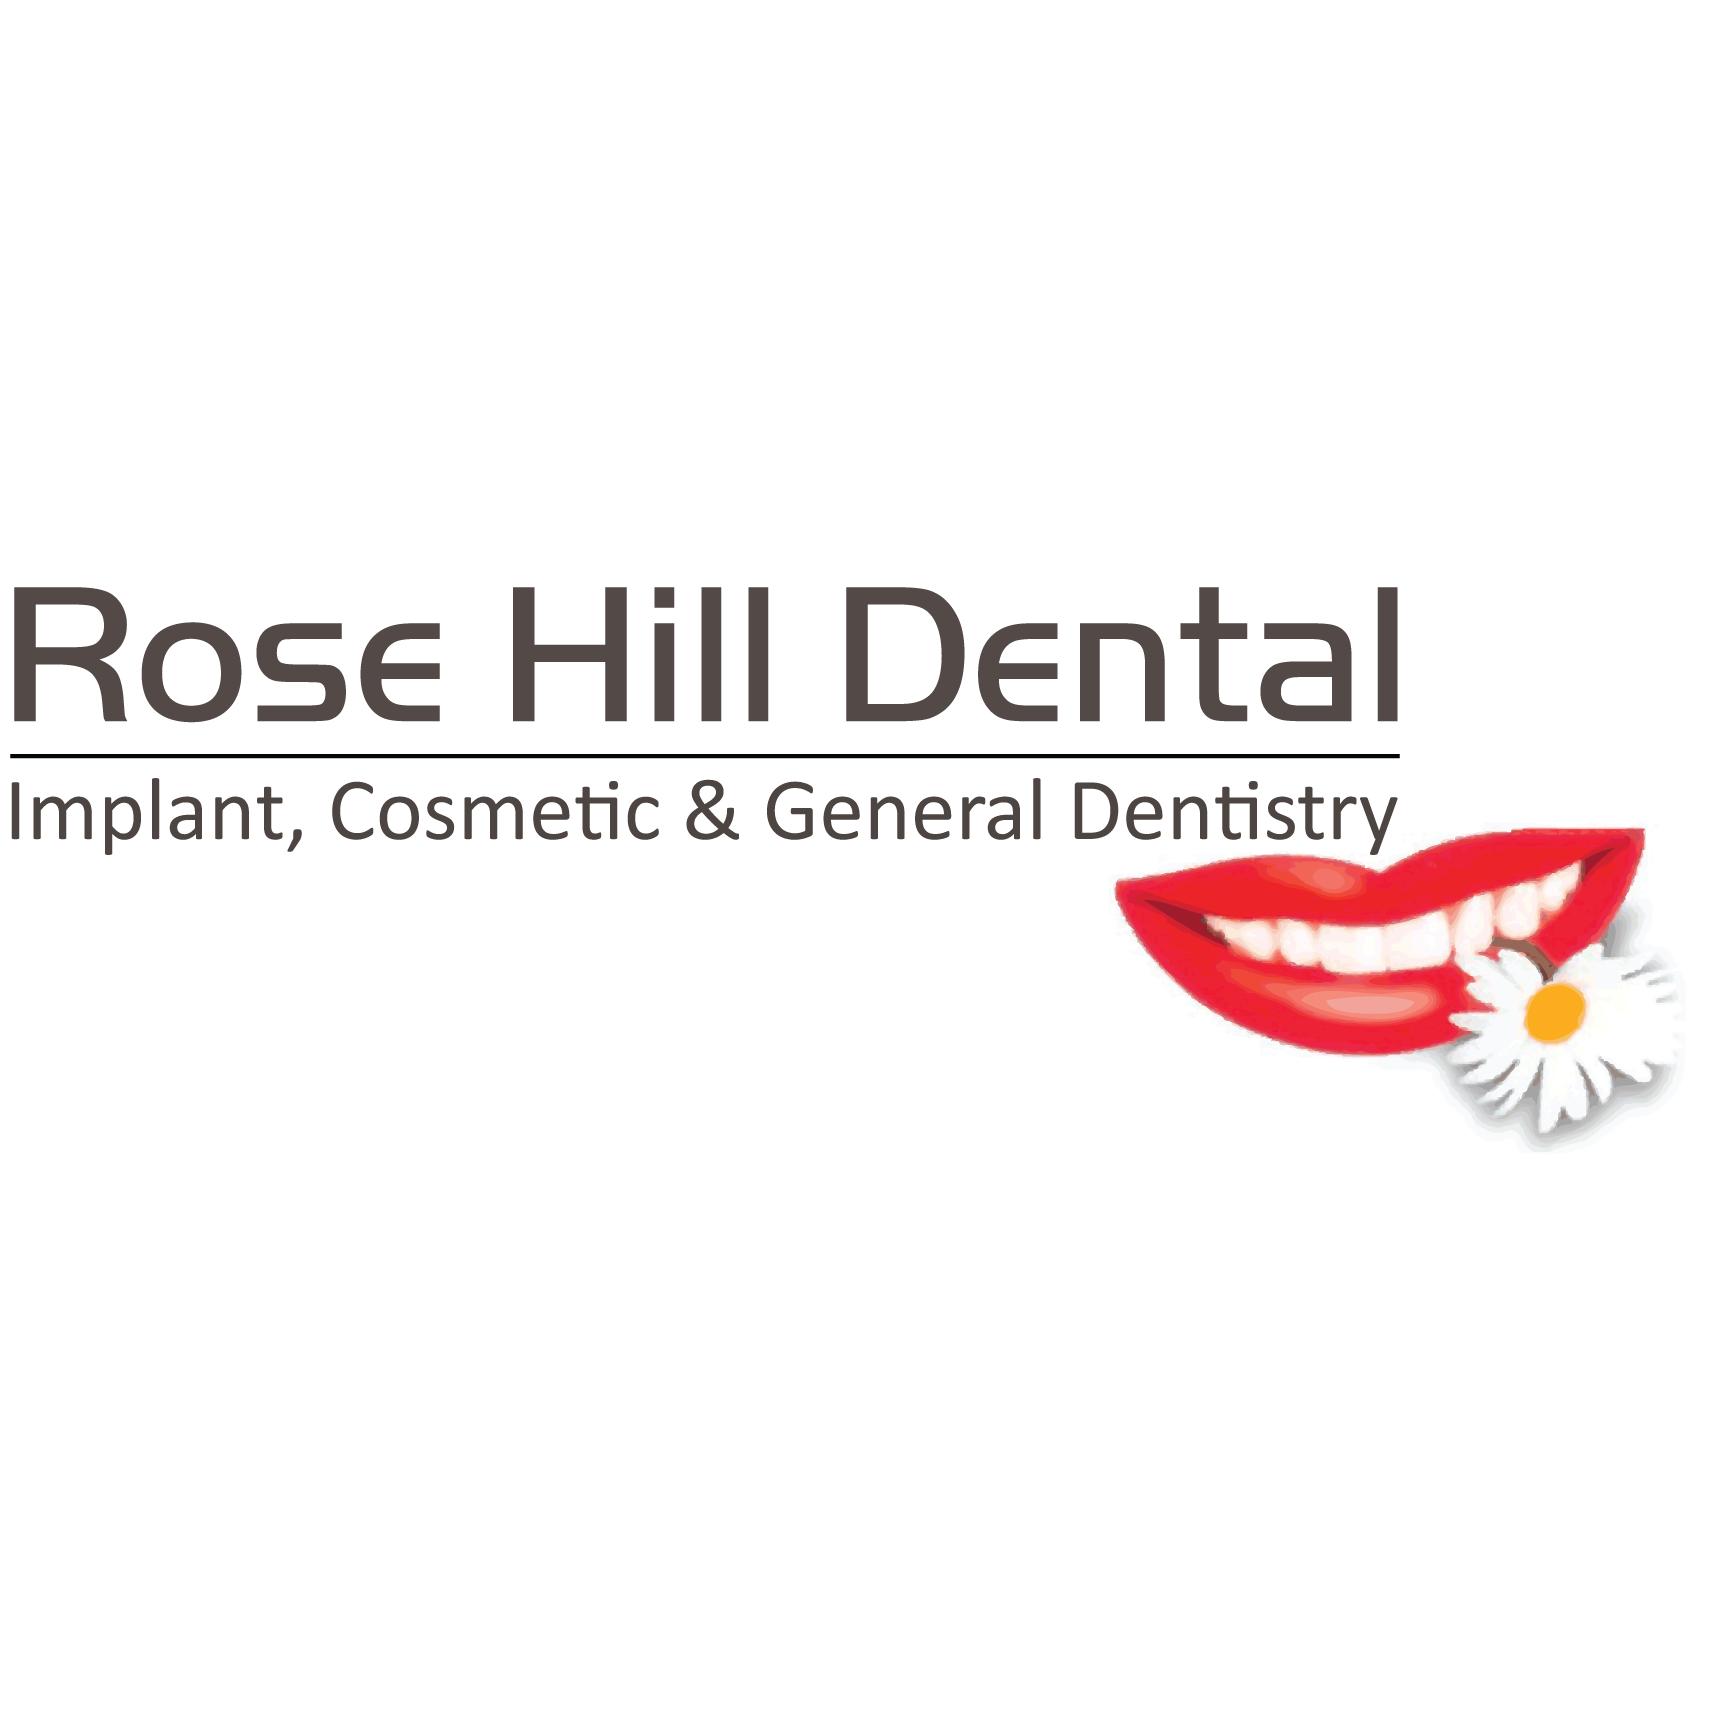 Andrea Botar D.D.S. - Rose Hill Dental - Hewlett, New York